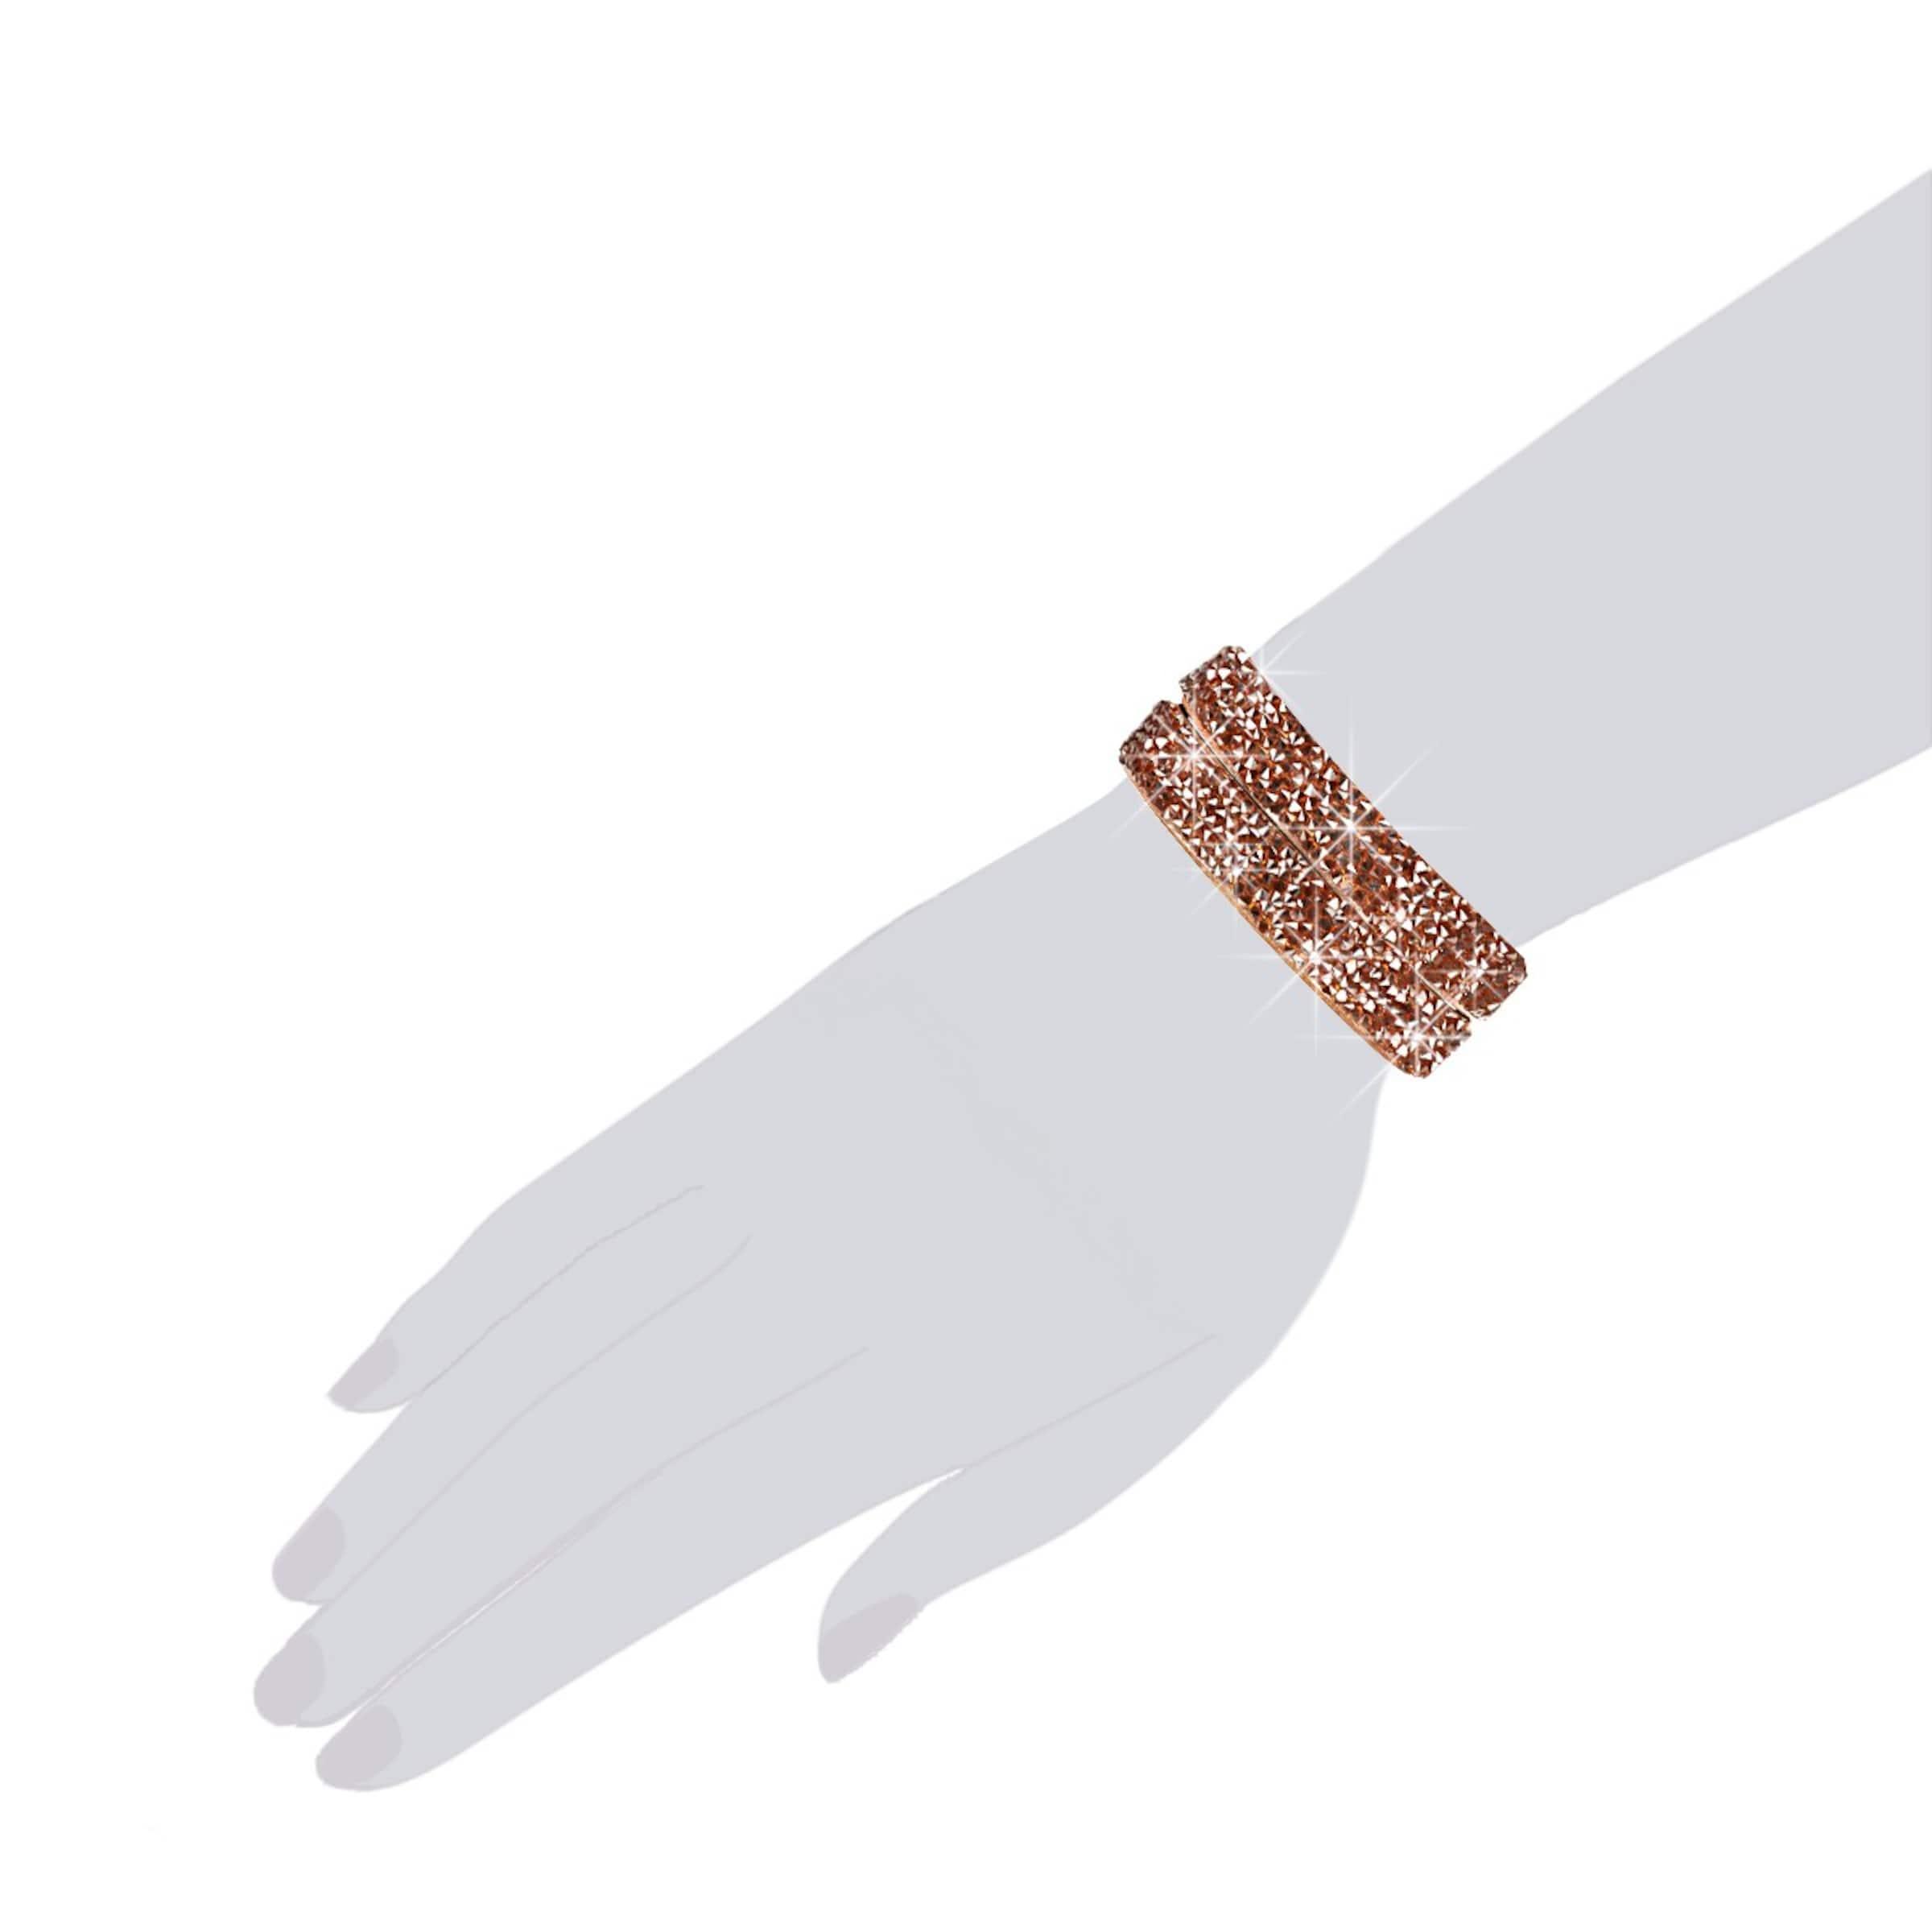 Rafaela Donata Armband Rabatt Authentisch Freies Modernes Verschiffen 0KroN